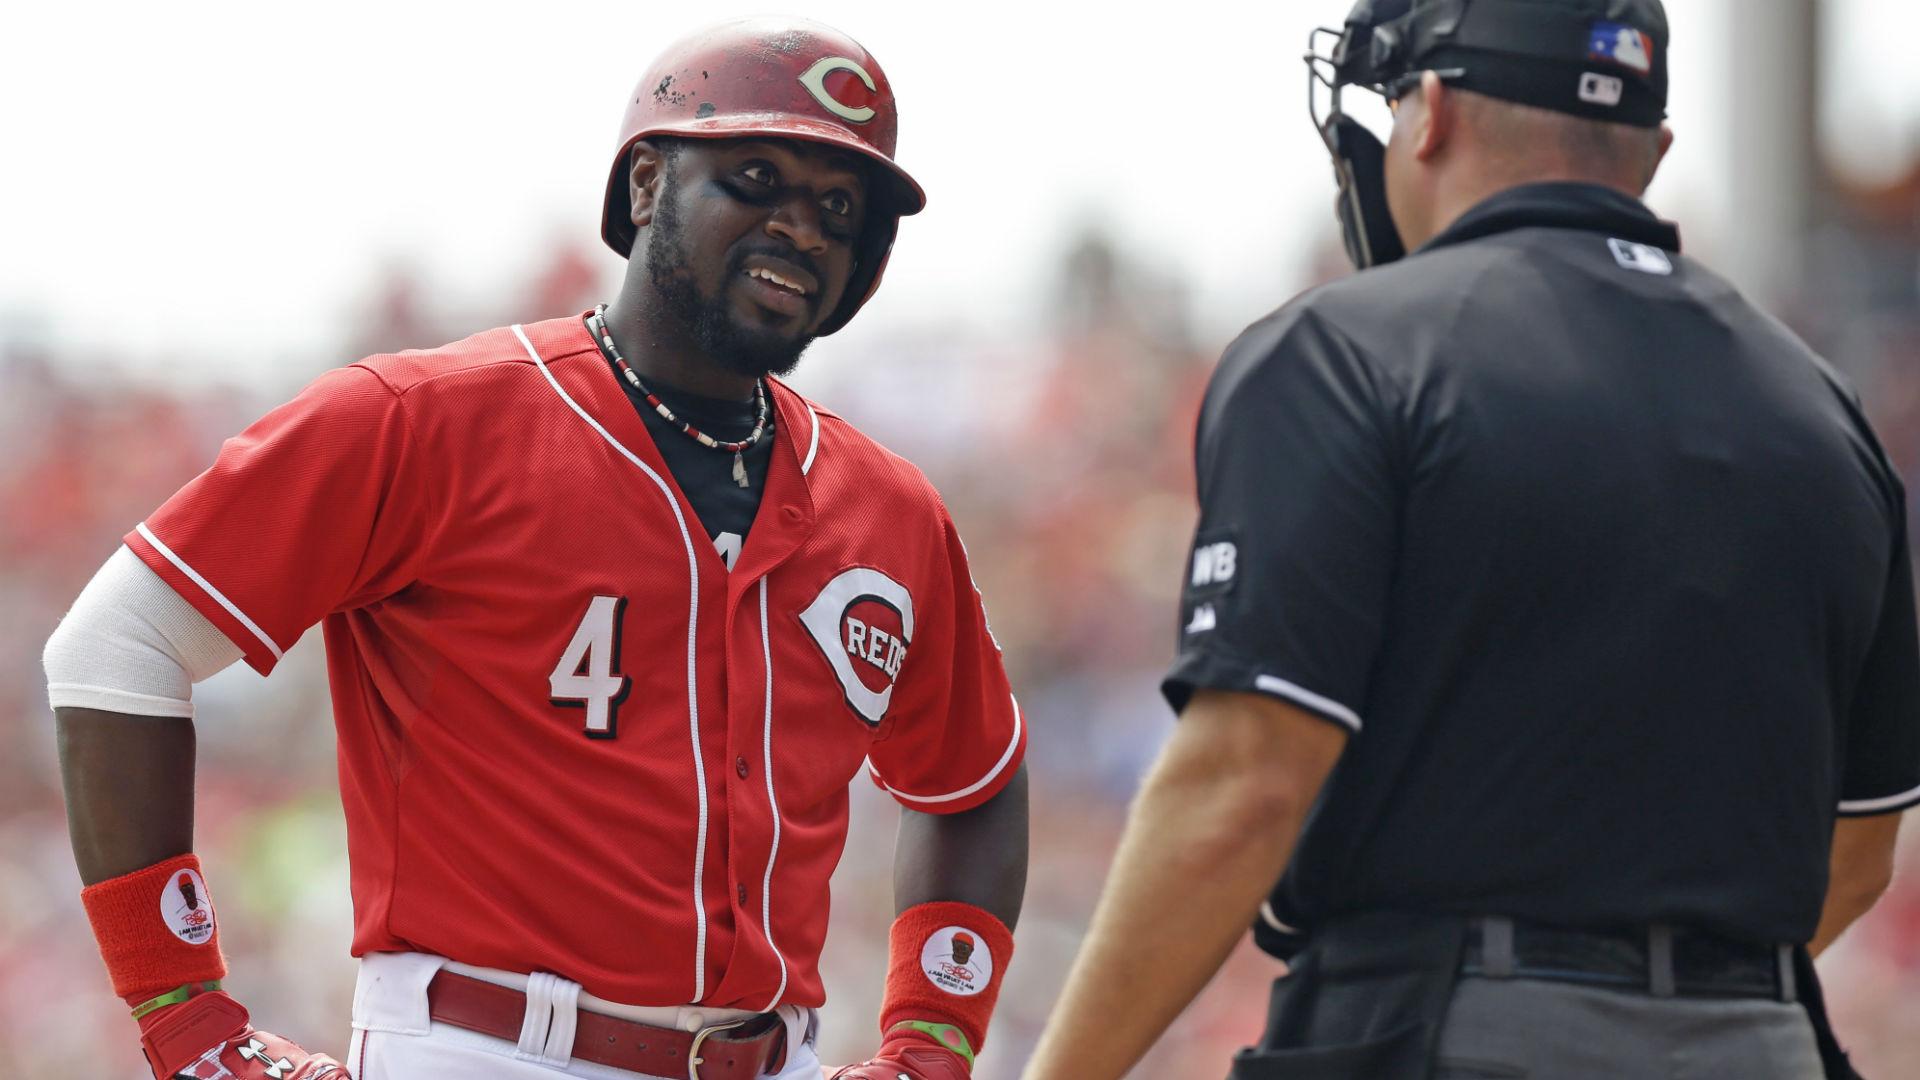 Daily fantasy baseball lineup: Saturday's buy/sell picks in DraftKings leagues